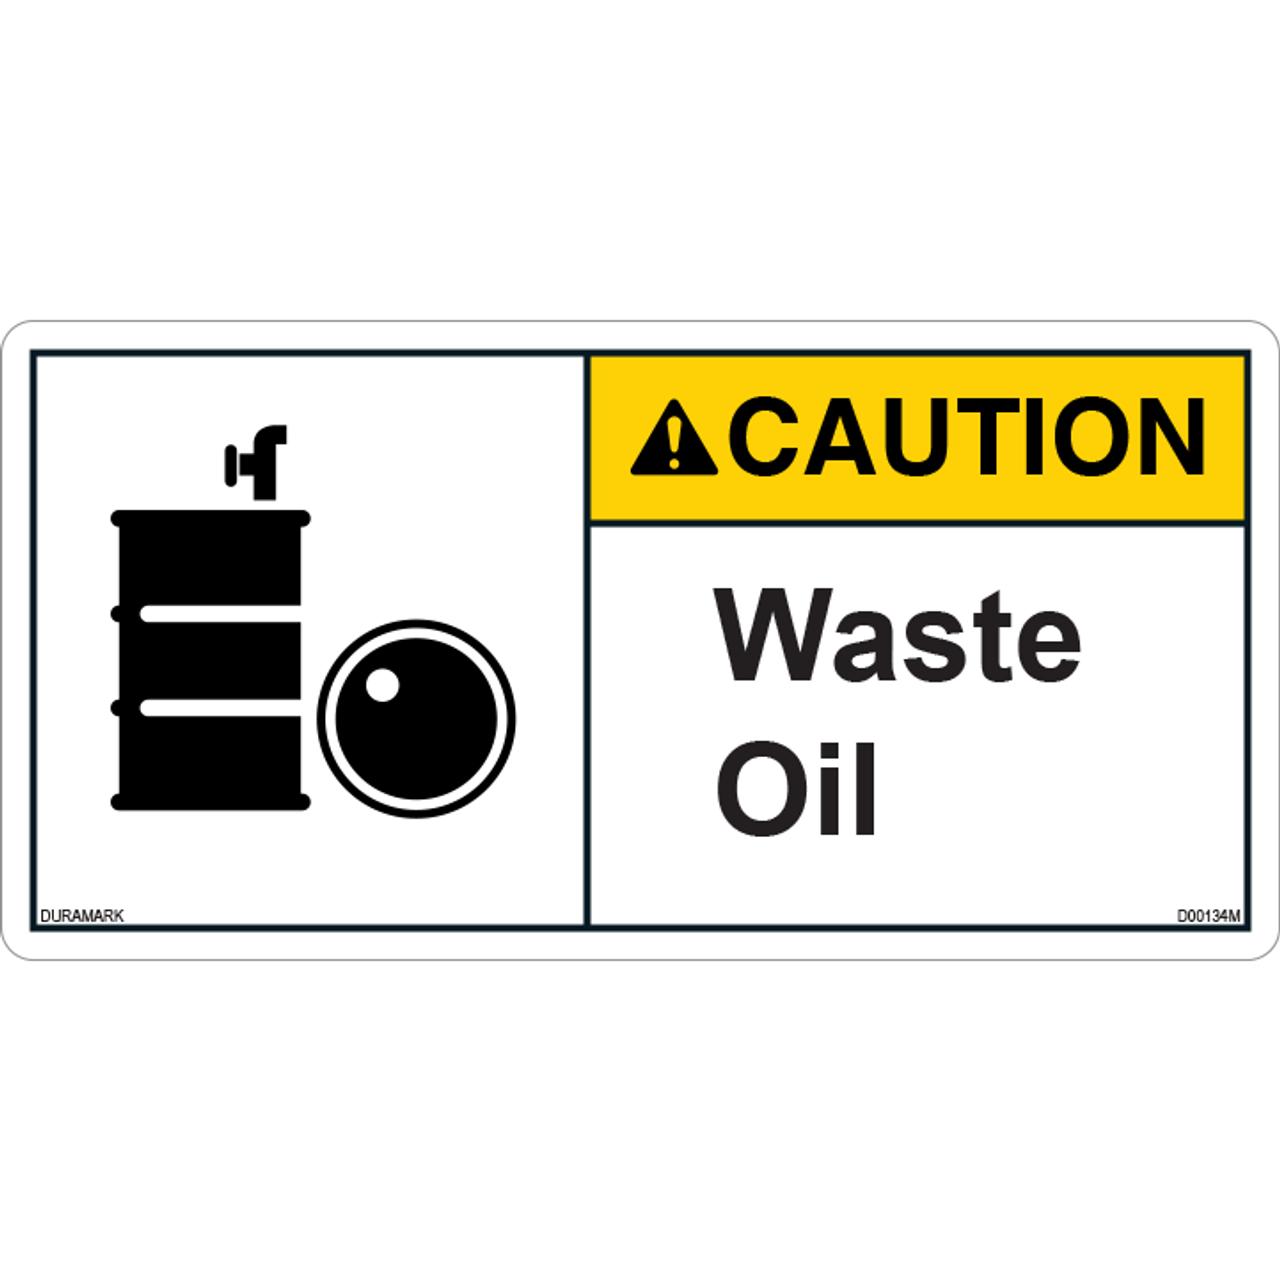 ANSI Safety Label - Caution - Waste Oil